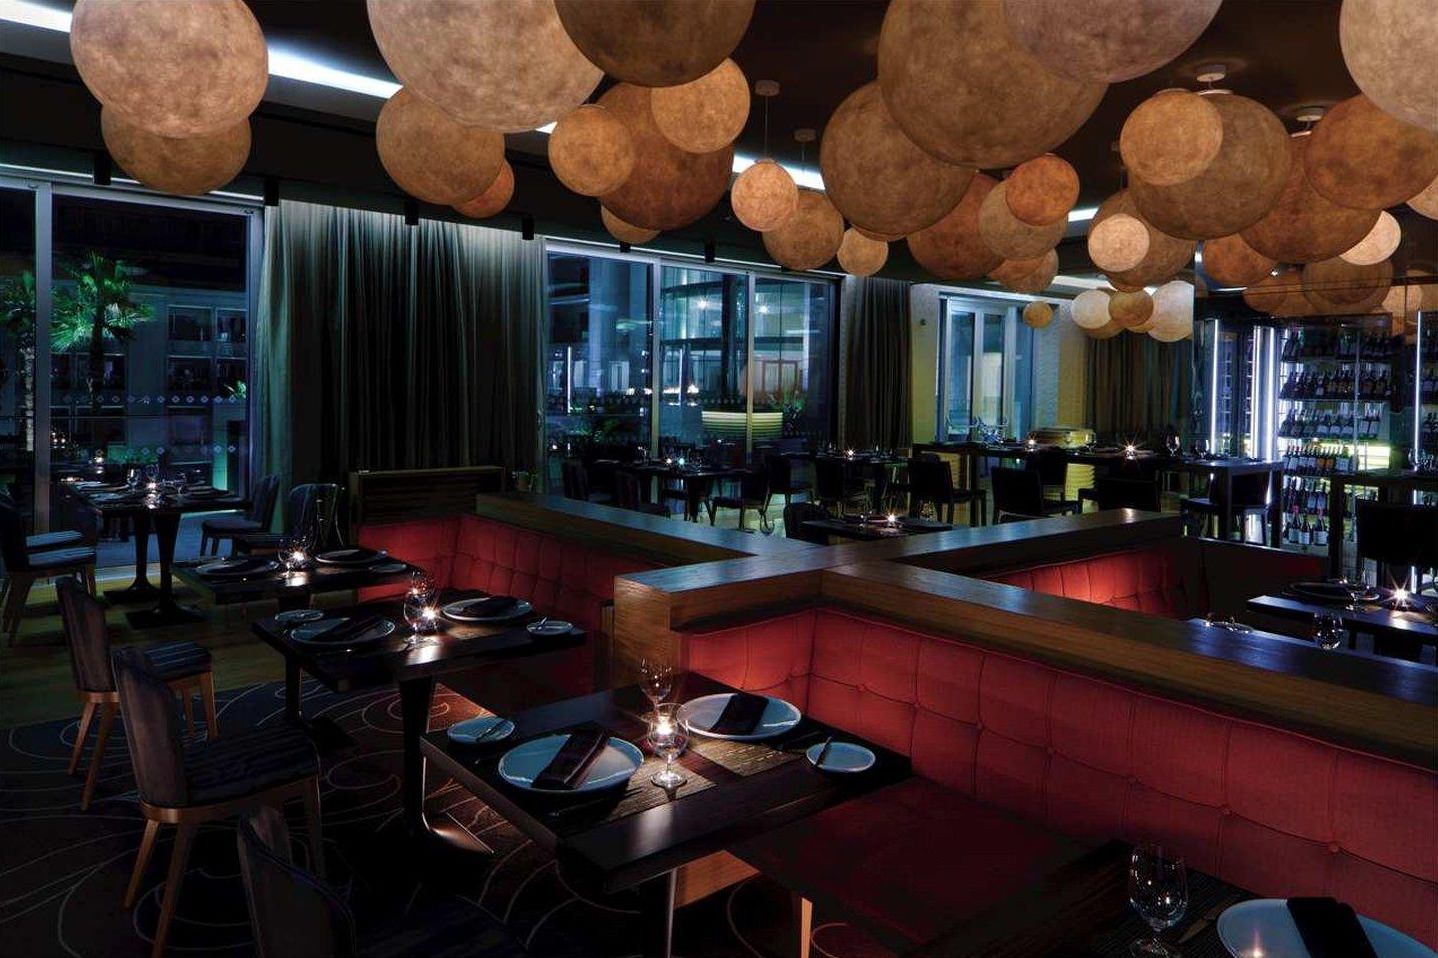 conrad_algarve_restaurant2.jpg